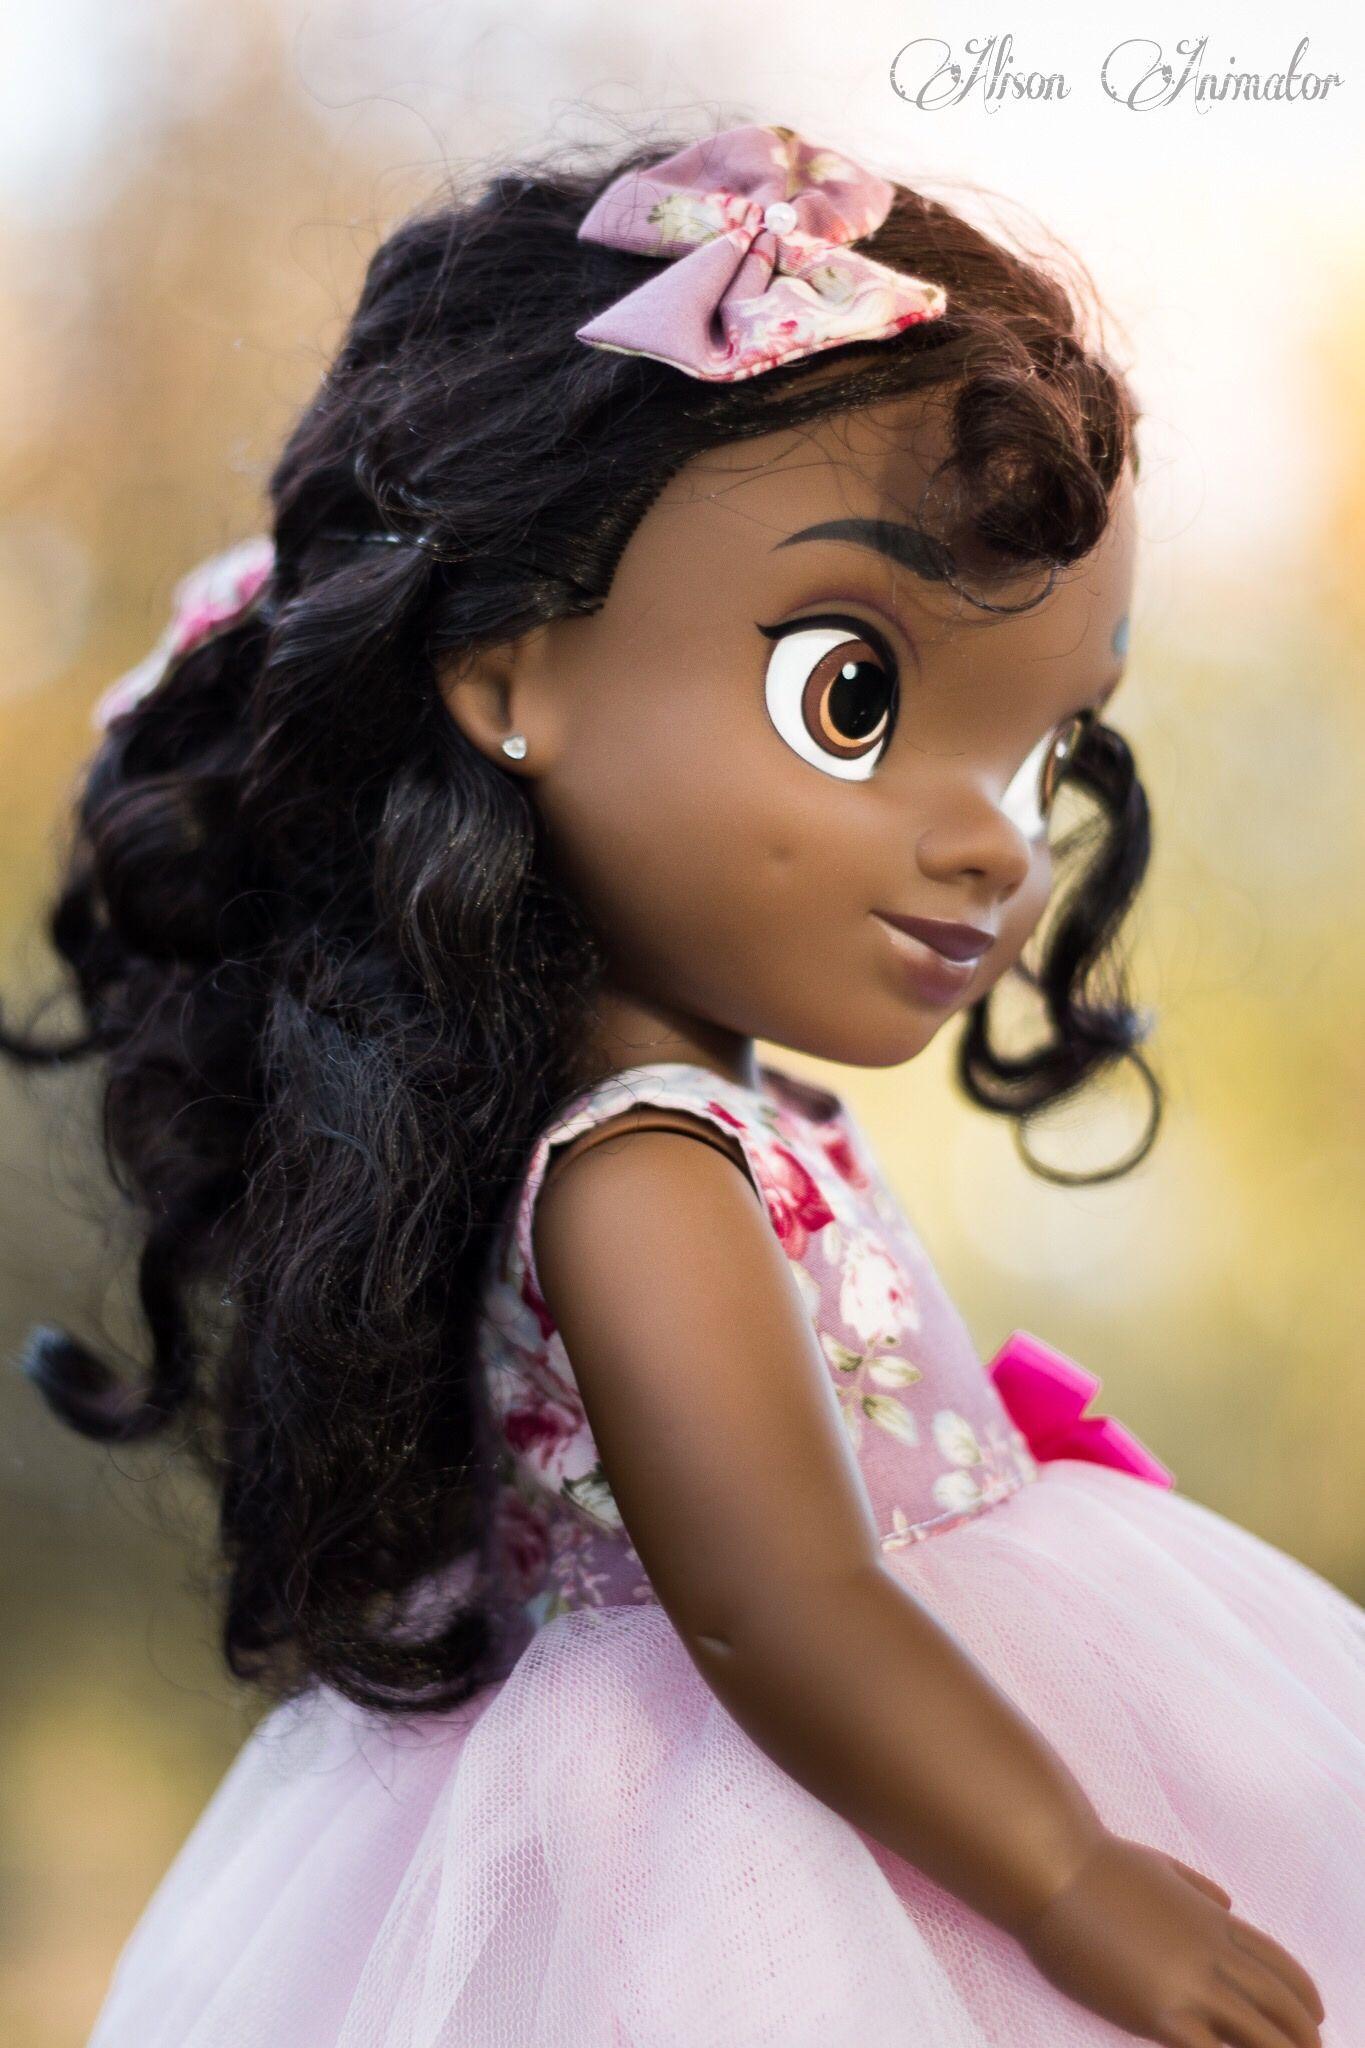 tiana animator doll photography tiana poupee animator disney photo